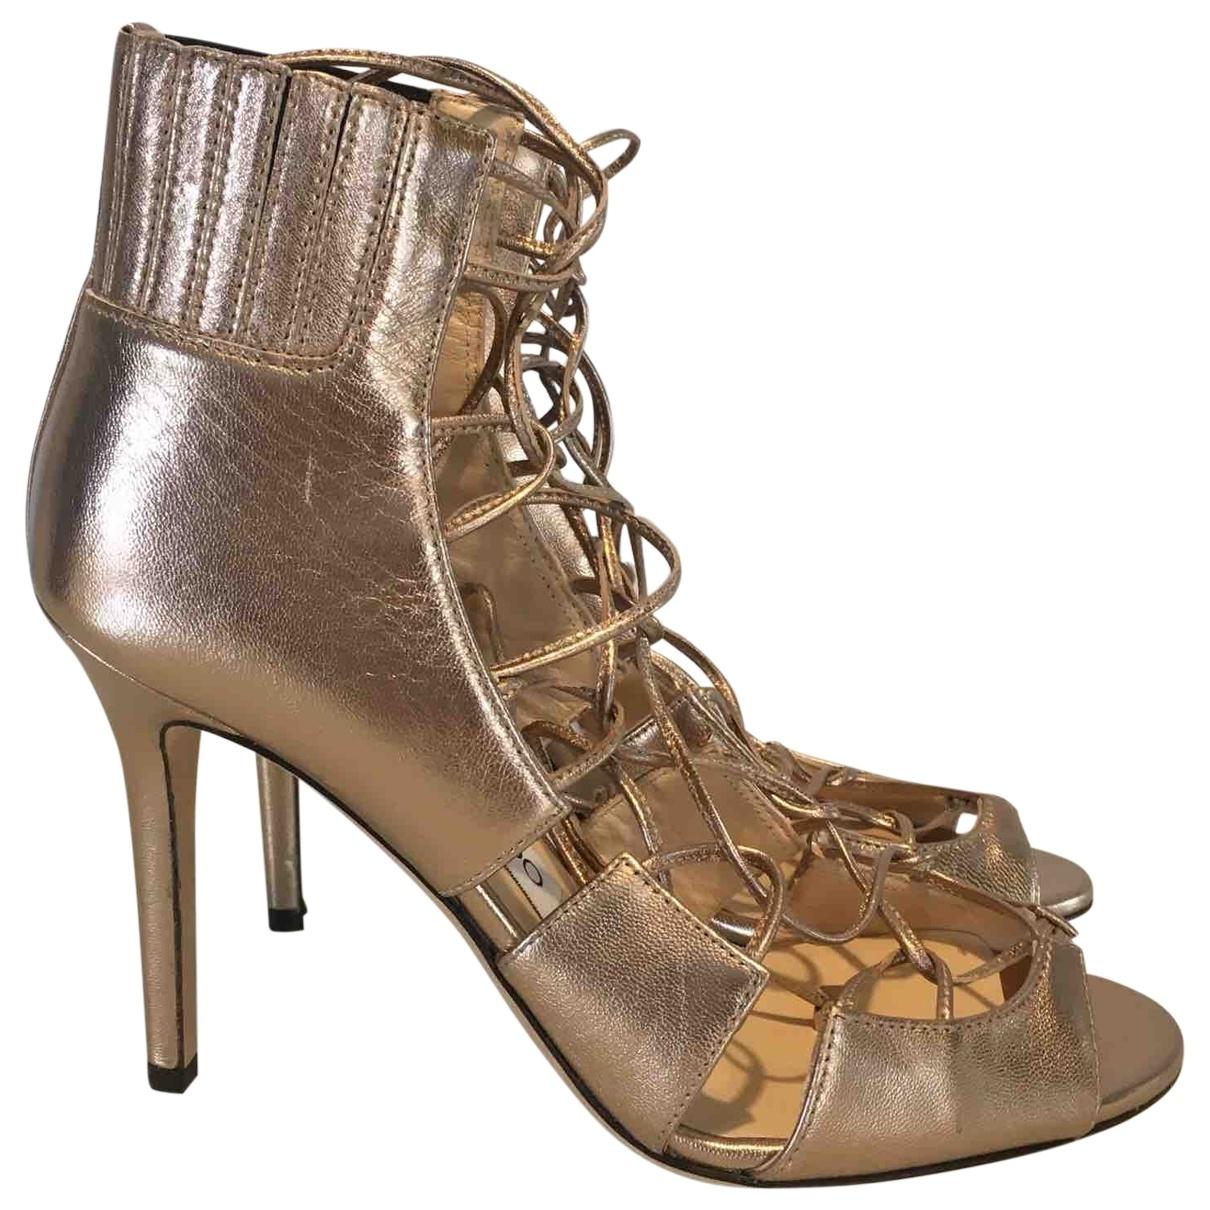 Jimmy Choo \N Gold Leather Sandals for Women 36 EU